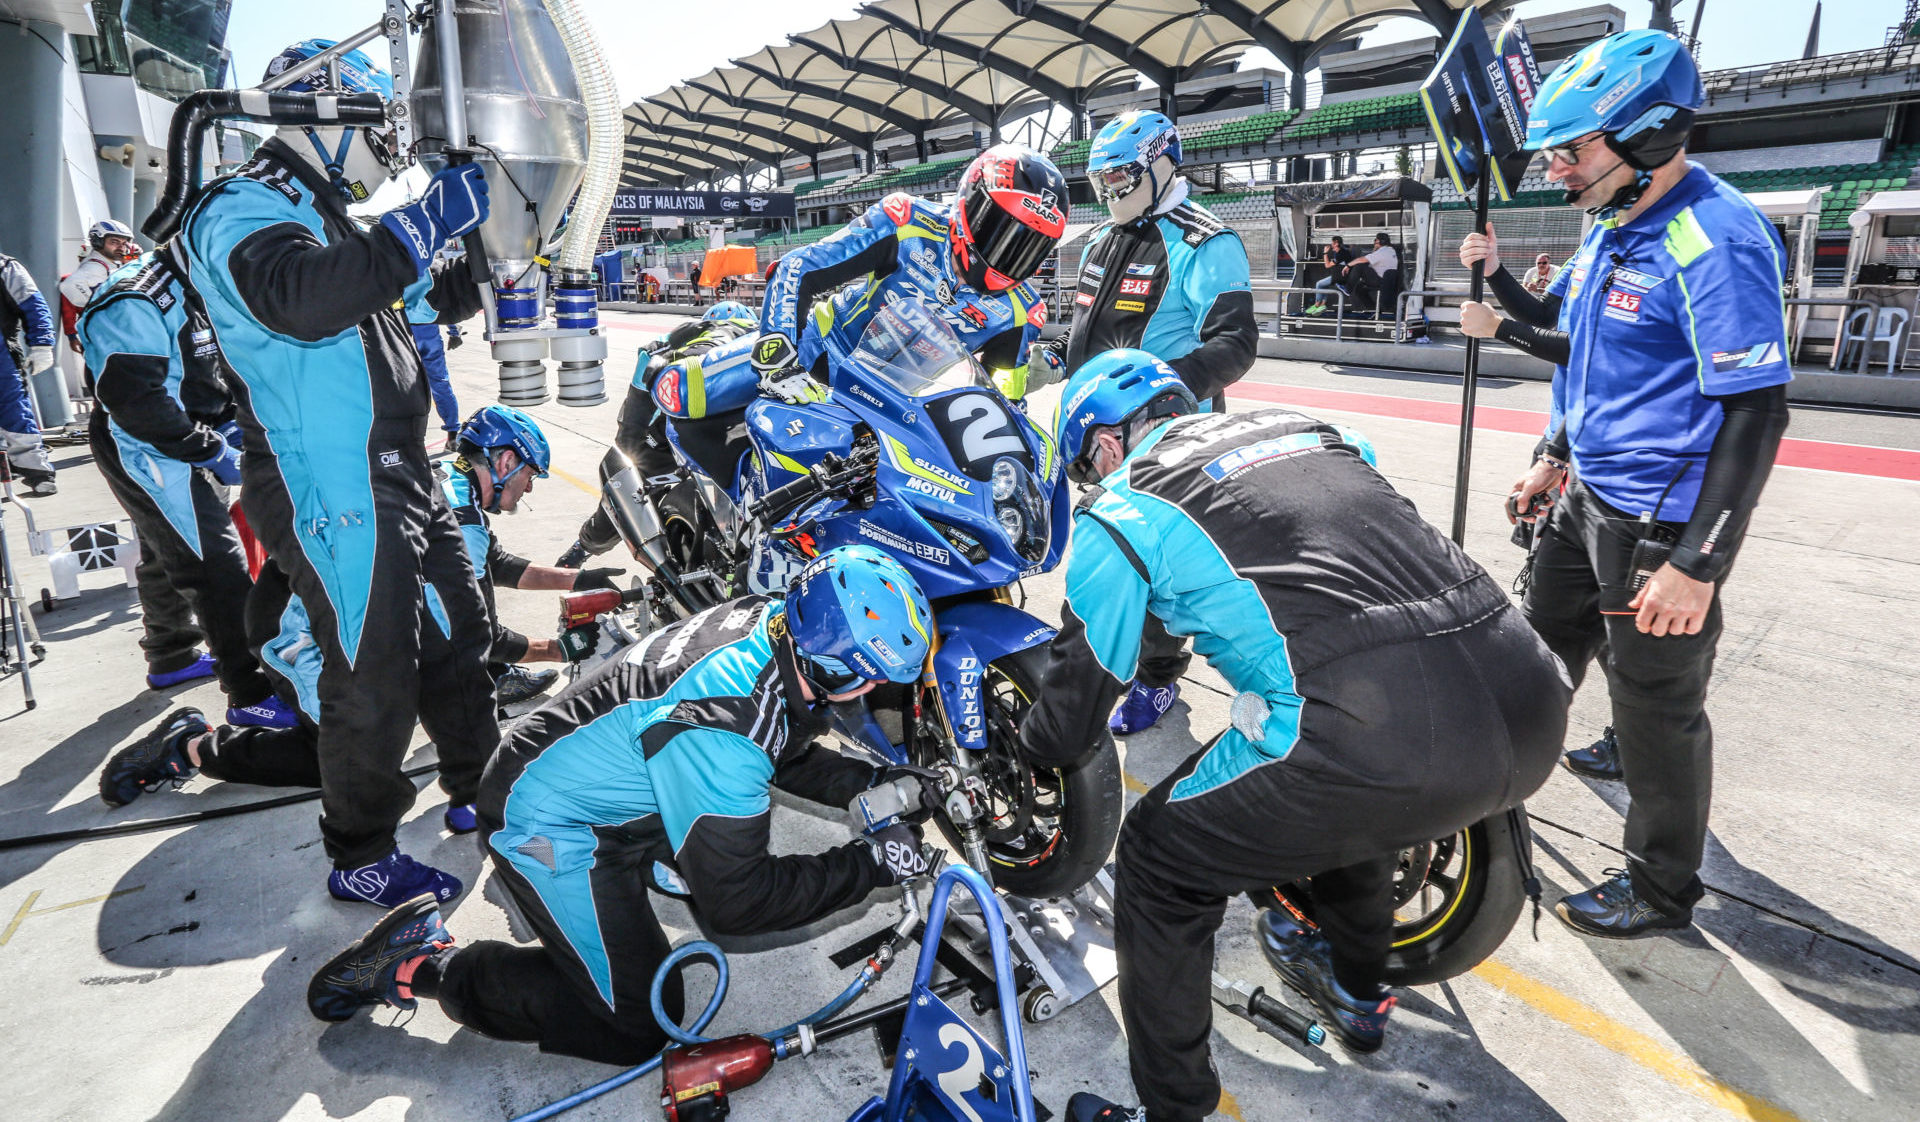 Suzuki Endurance Racing Team (SERT) leads the 2019-2020 FIM Endurance World Championship after the first two rounds. Photo courtesy of Team Suzuki Press Office.